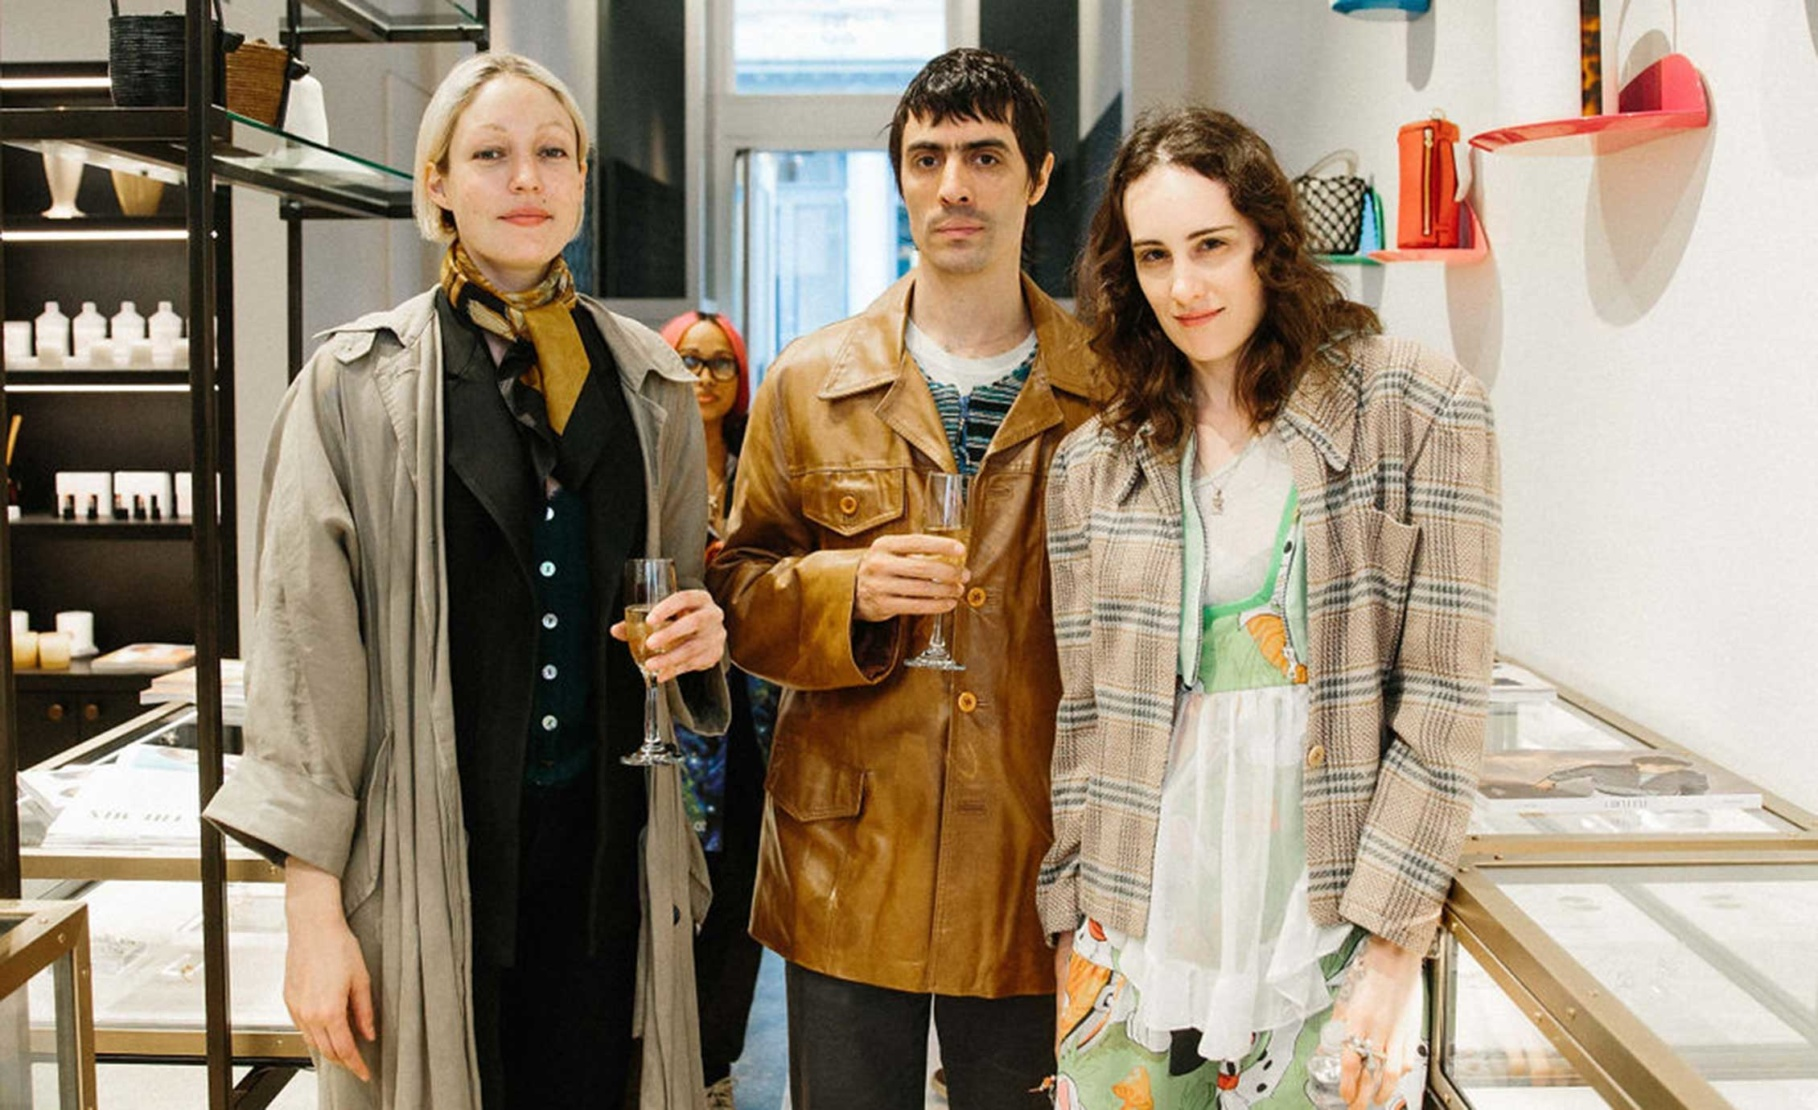 Erin Leland, Andrew and Raffaella Hanley